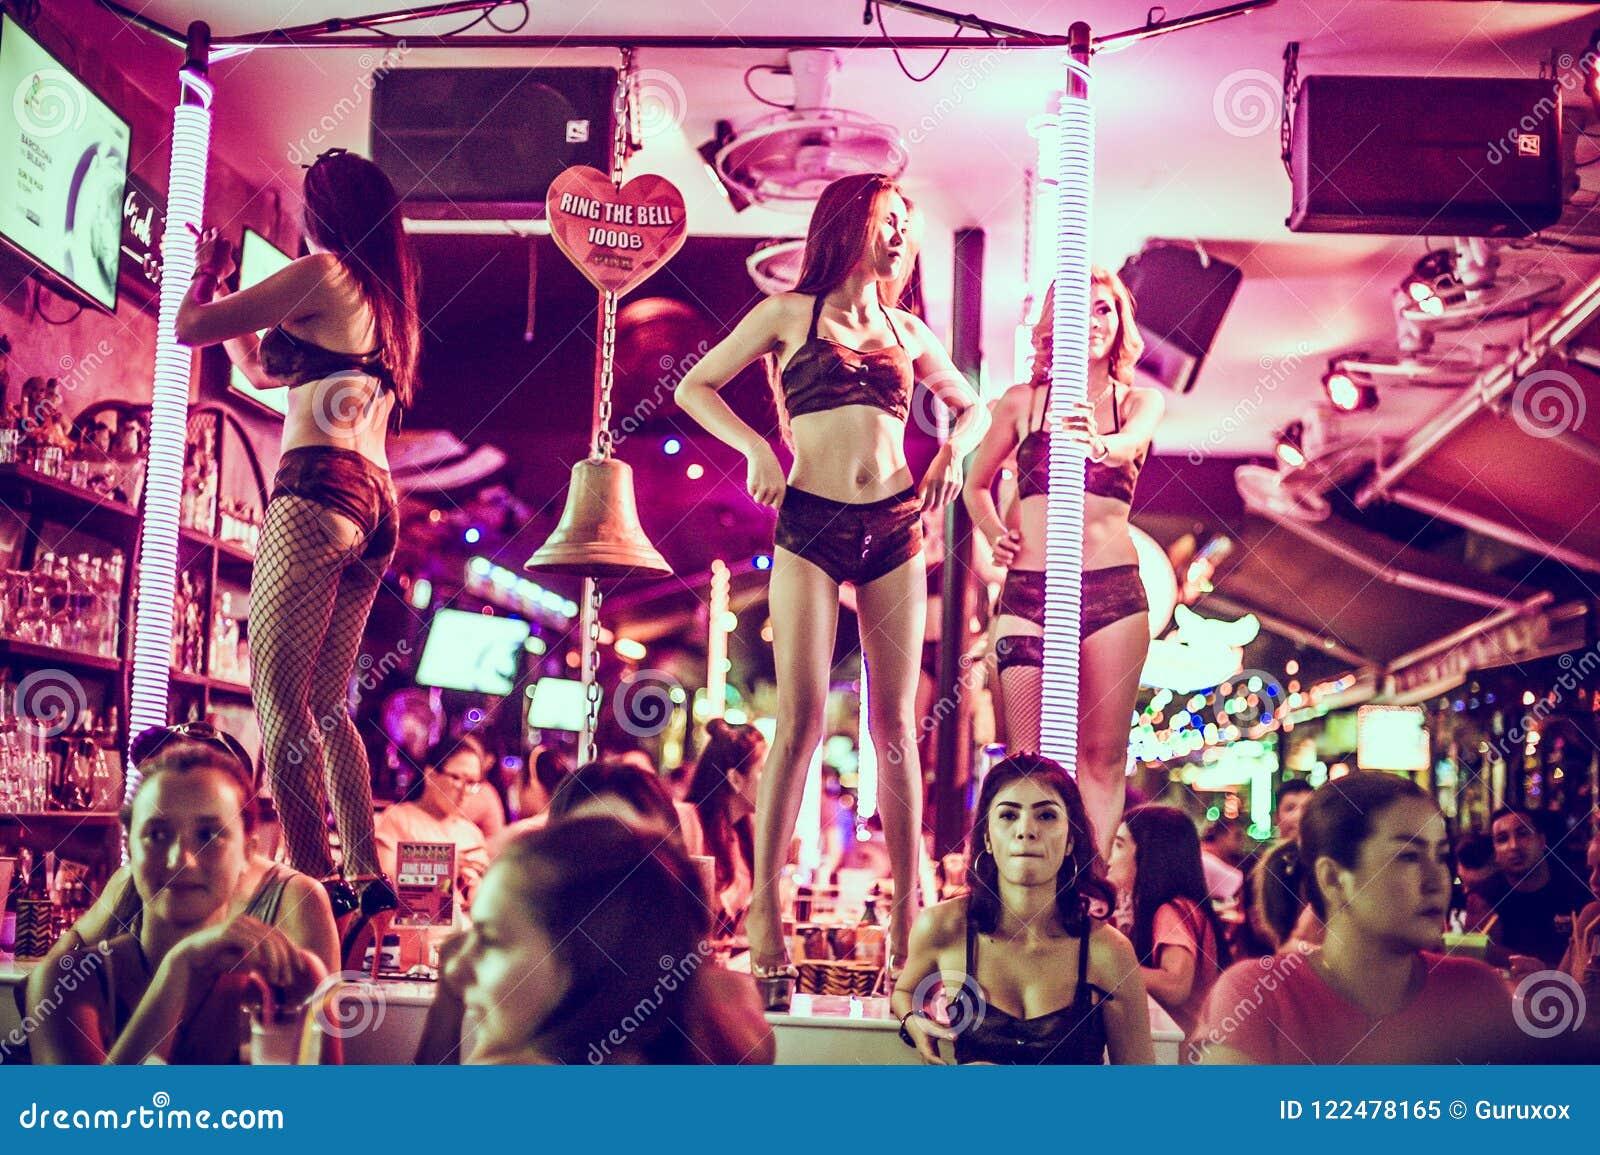 Thai bar girl prices 2018